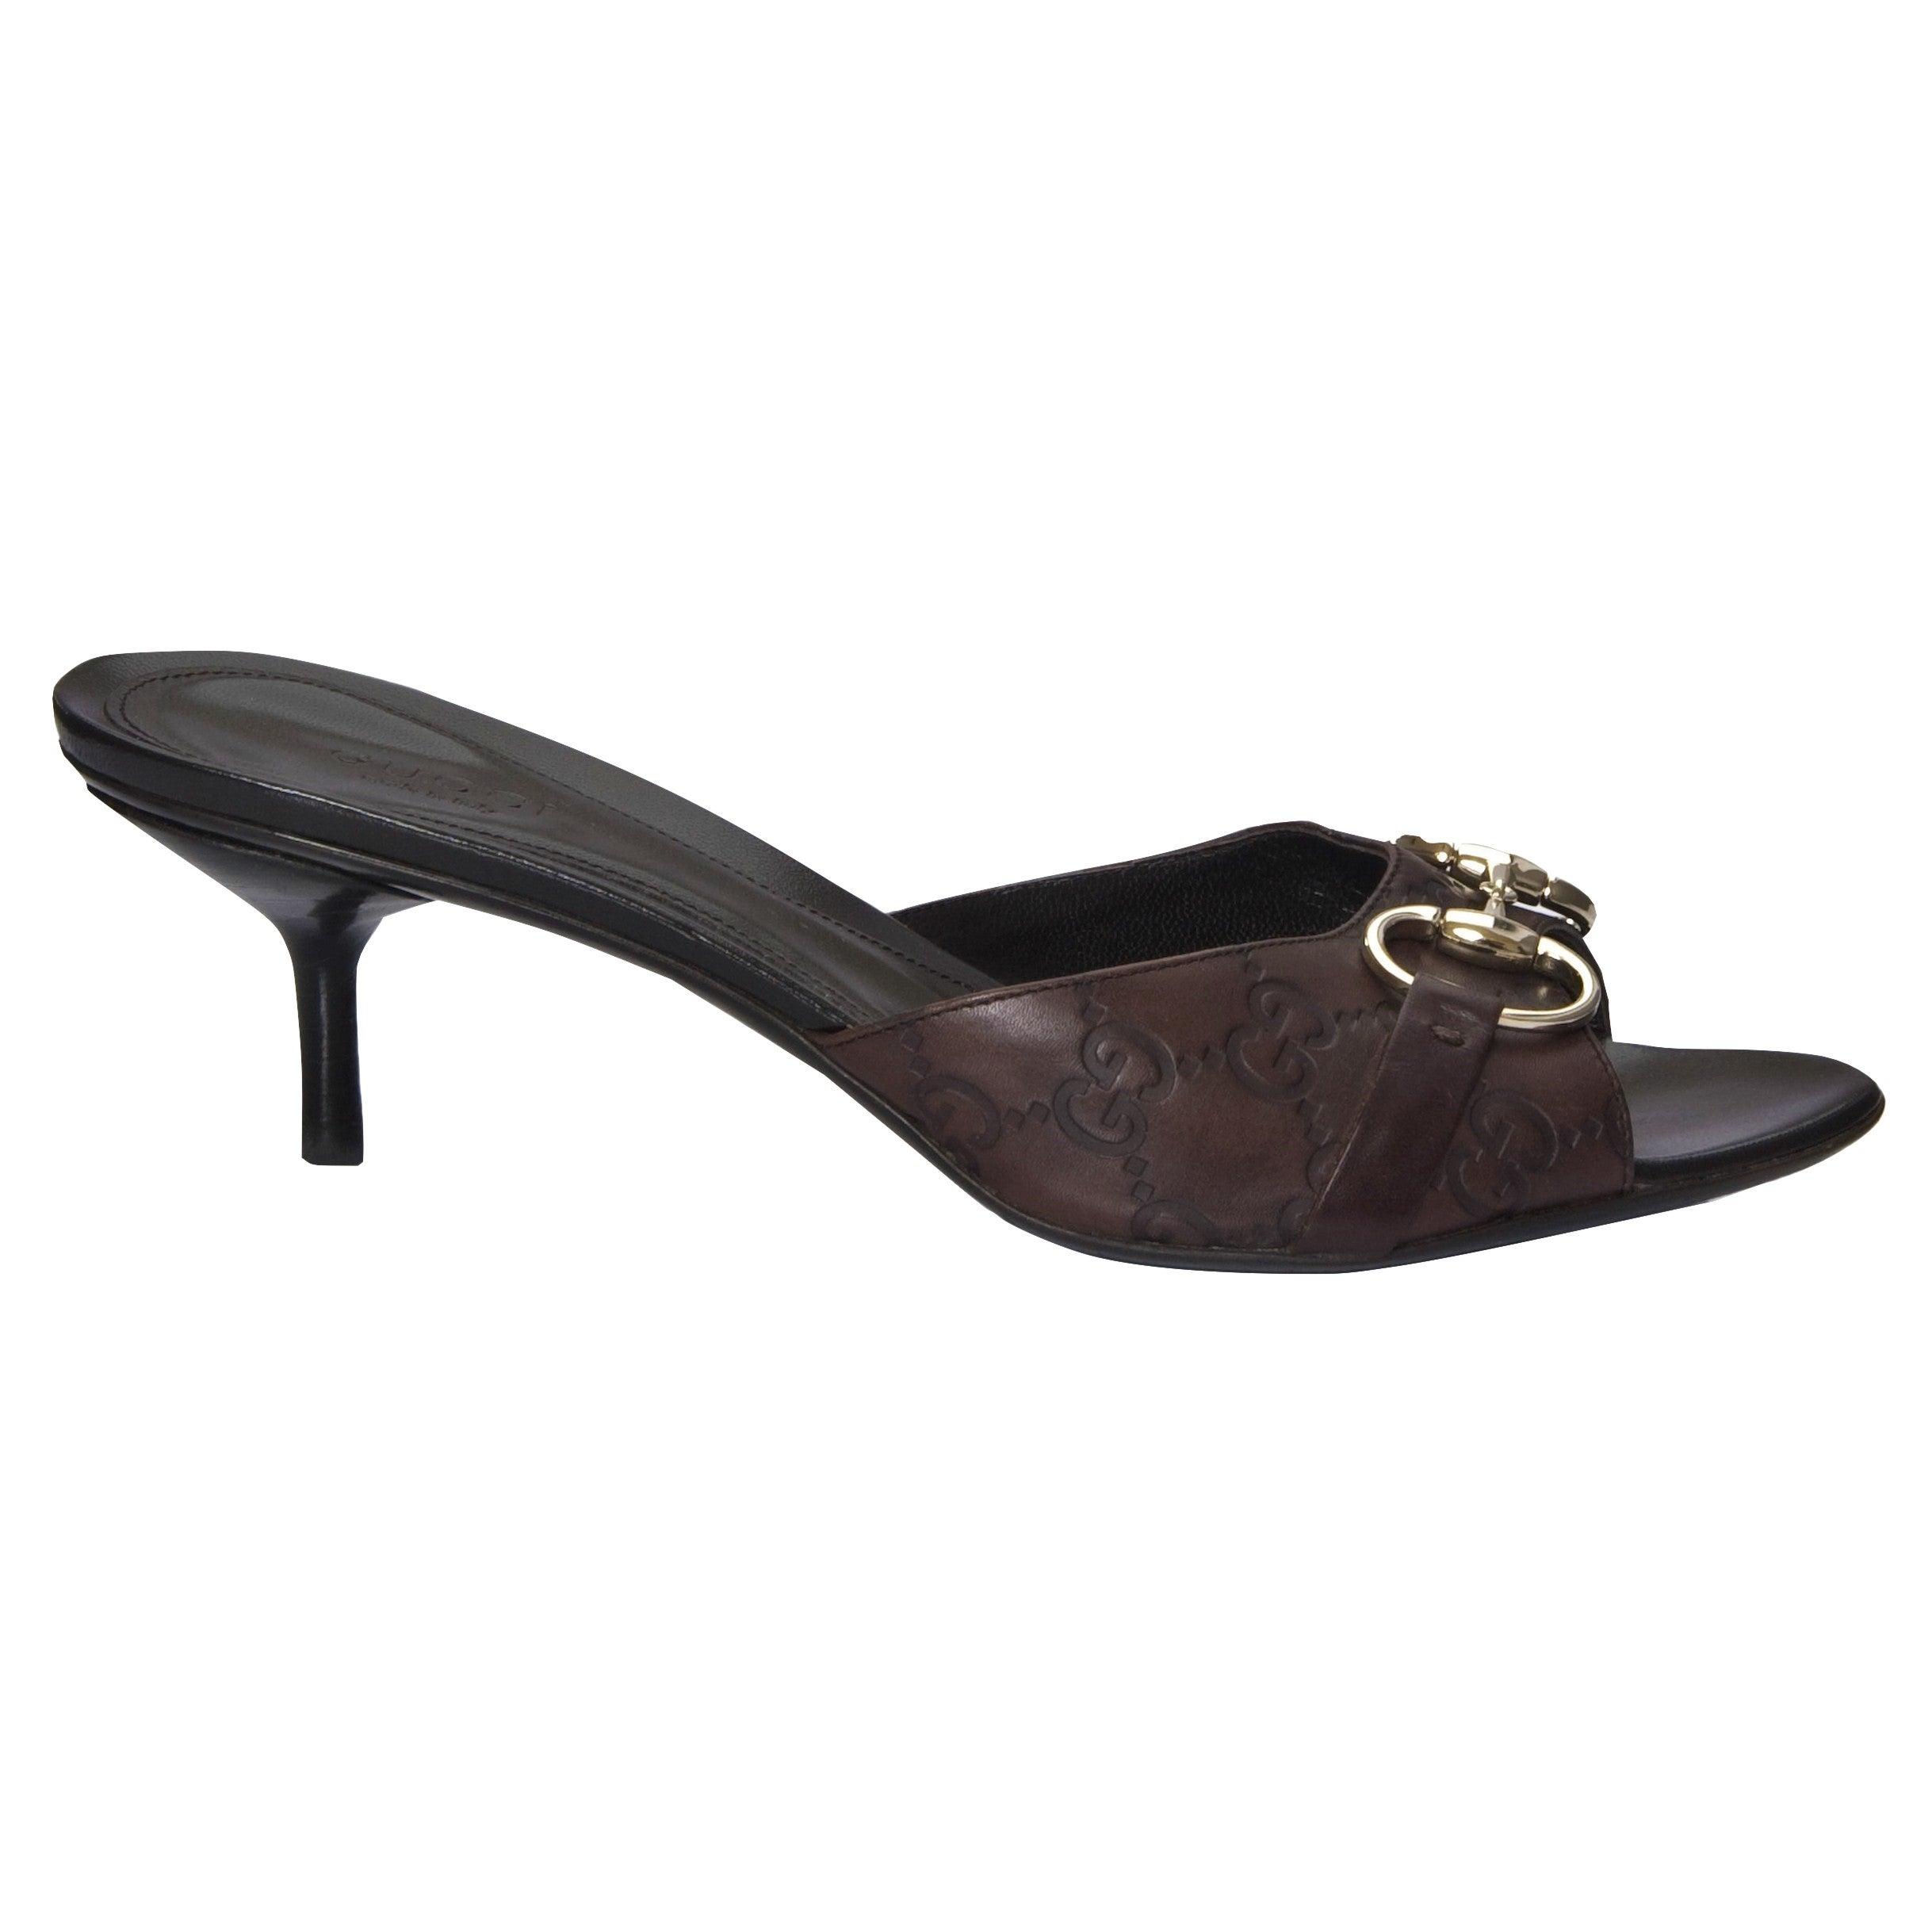 d5dde7e2c7b3 Gucci Size 7.5 Guccissima Horsebit Heels Slides Mules at 1stdibs